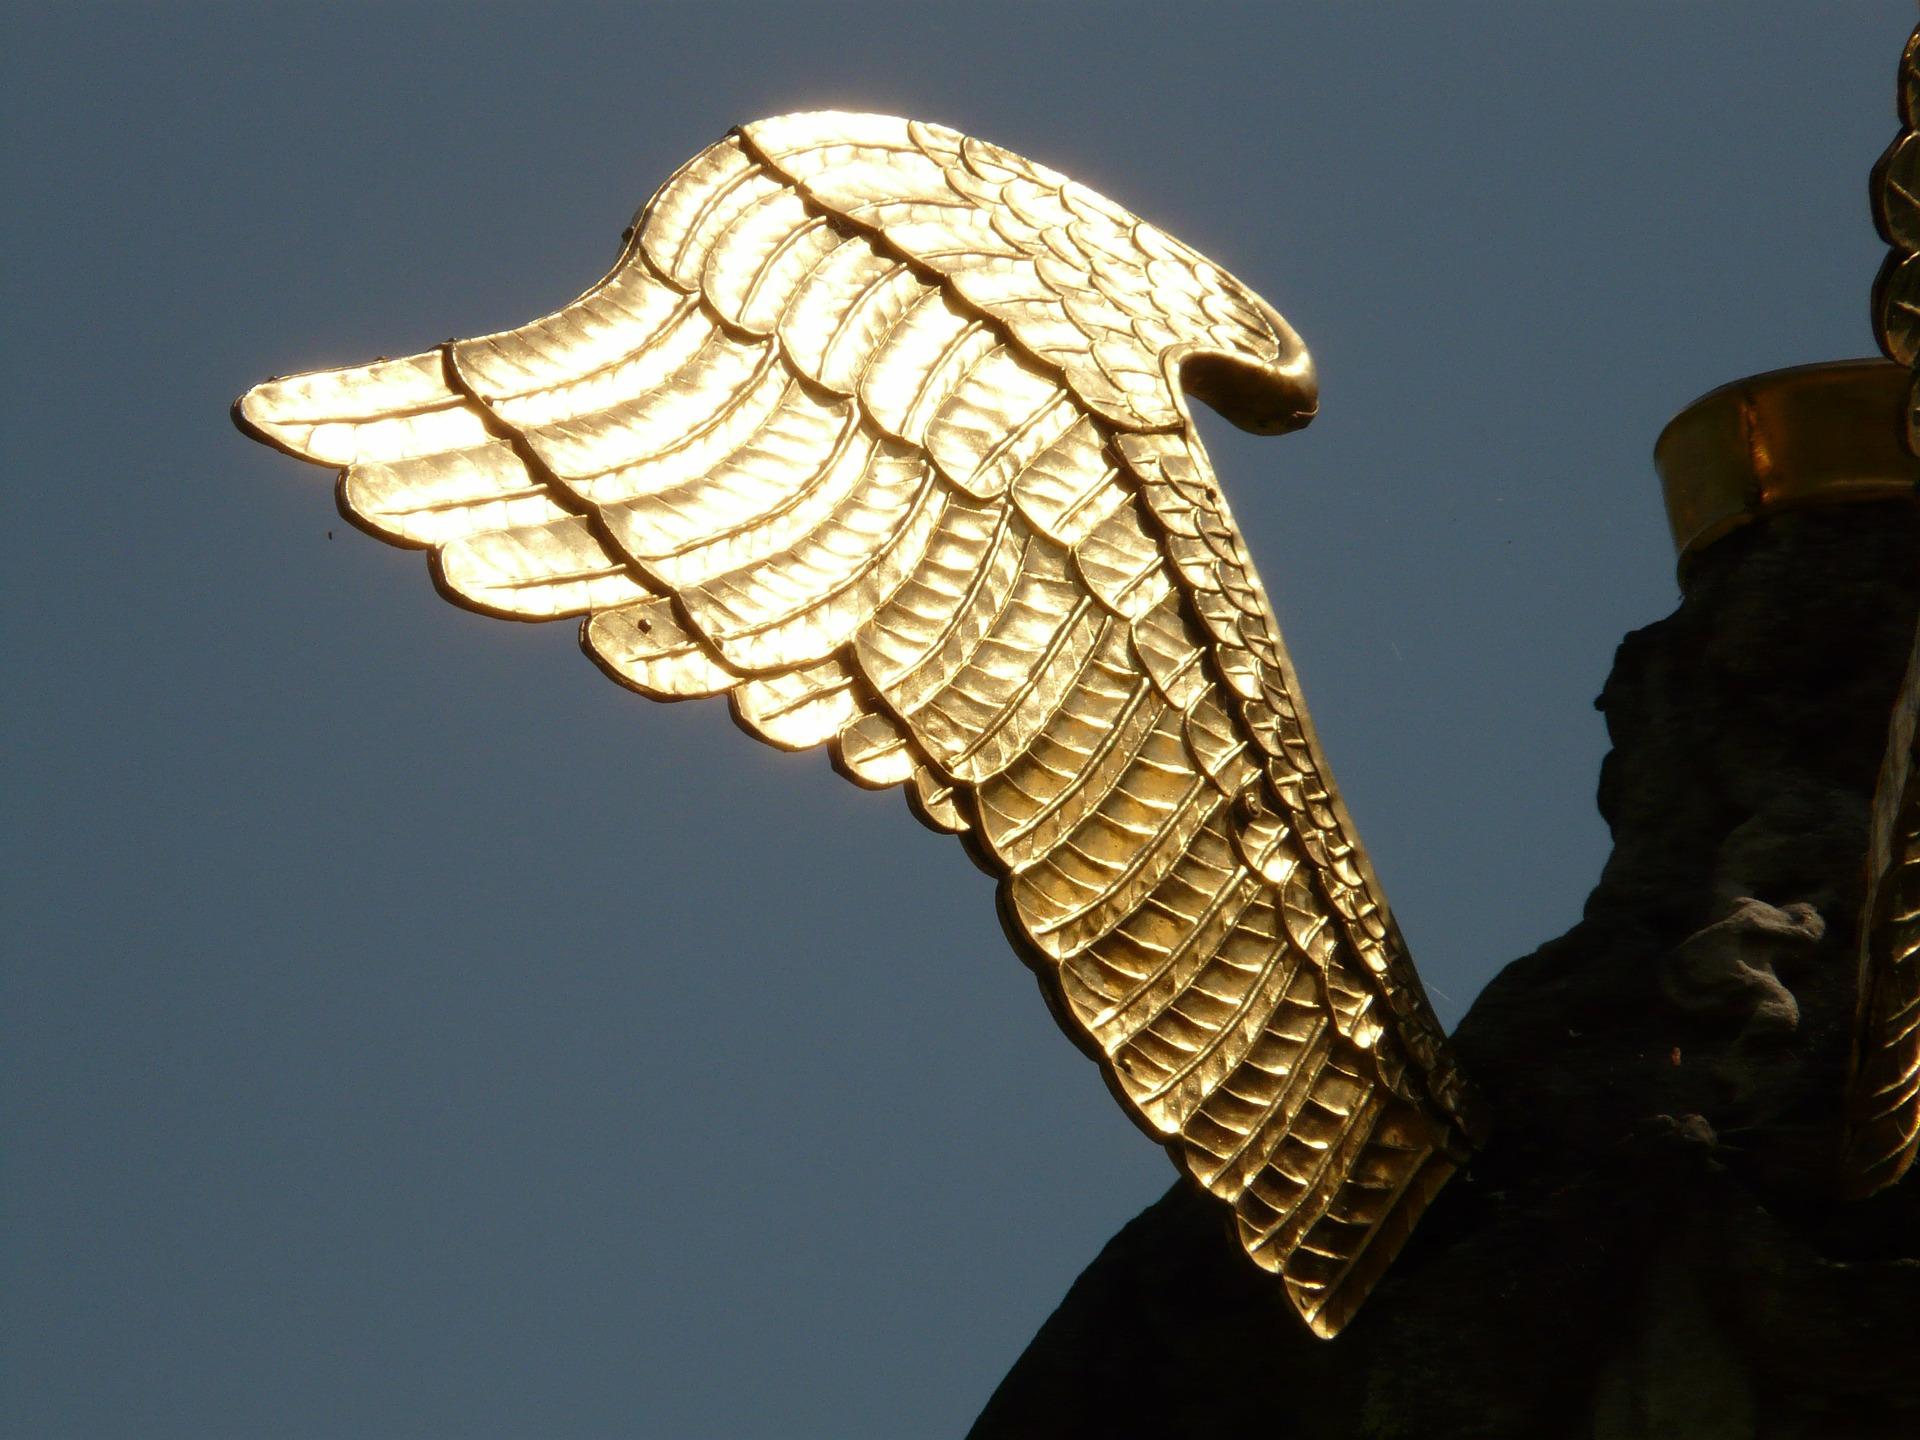 wing-3354_1920